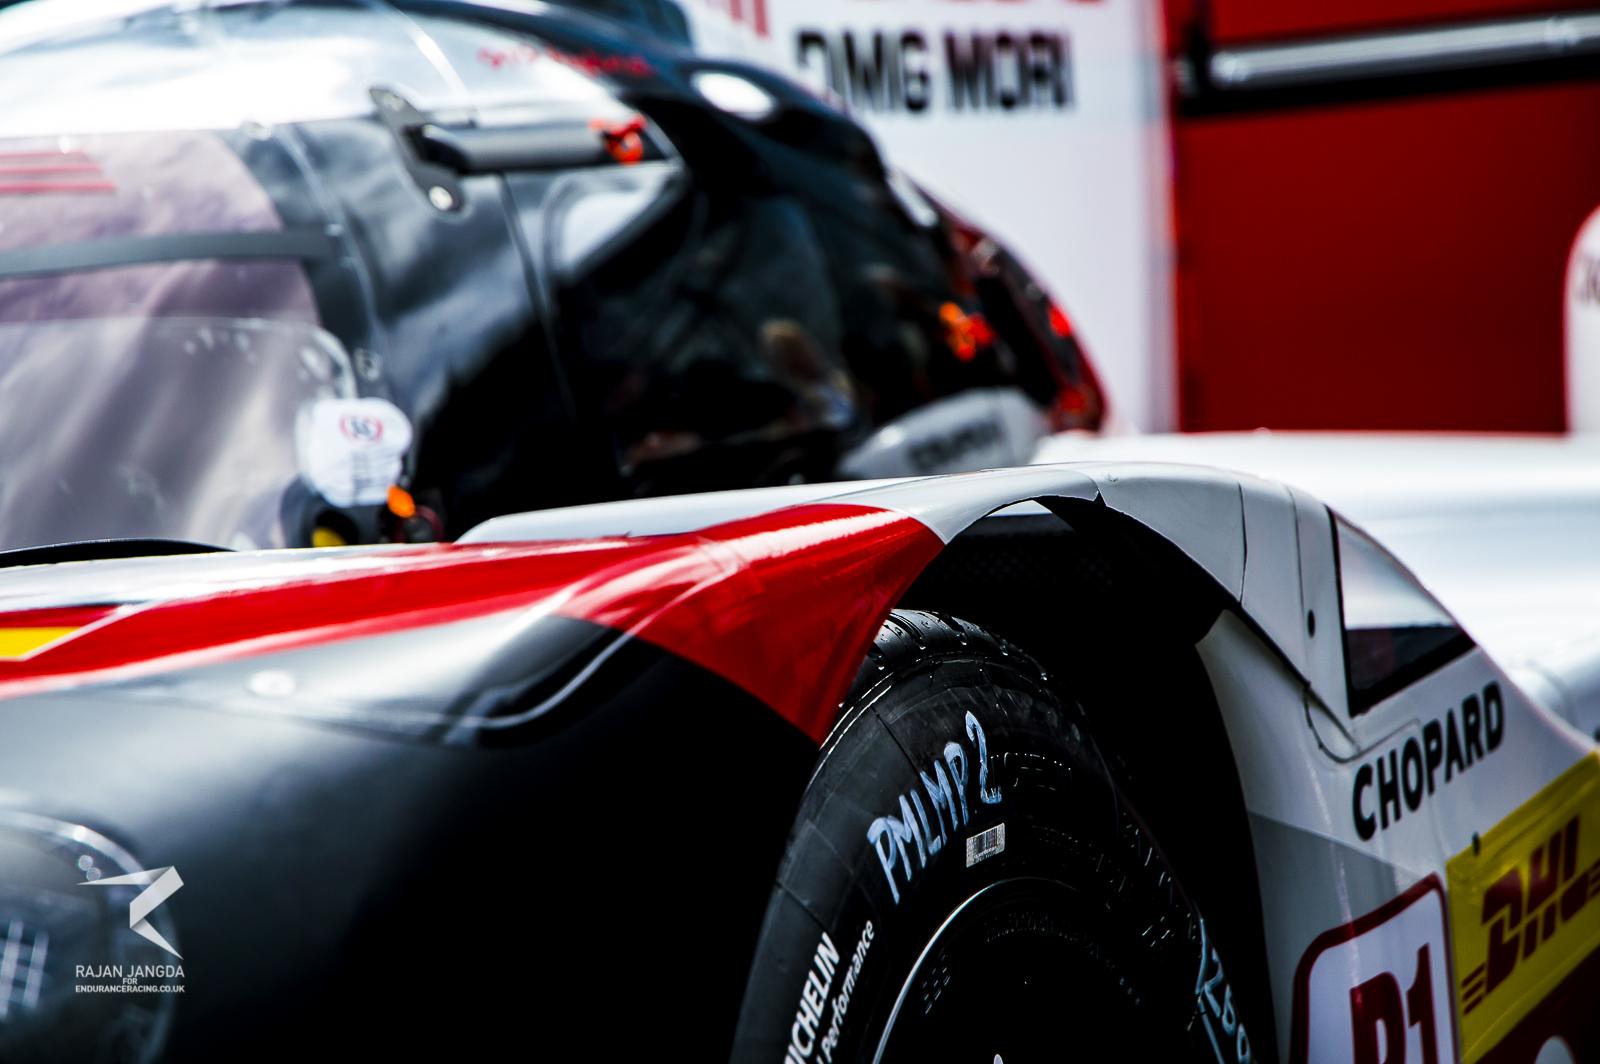 Porsche's new hidden mirrors, can you find them?